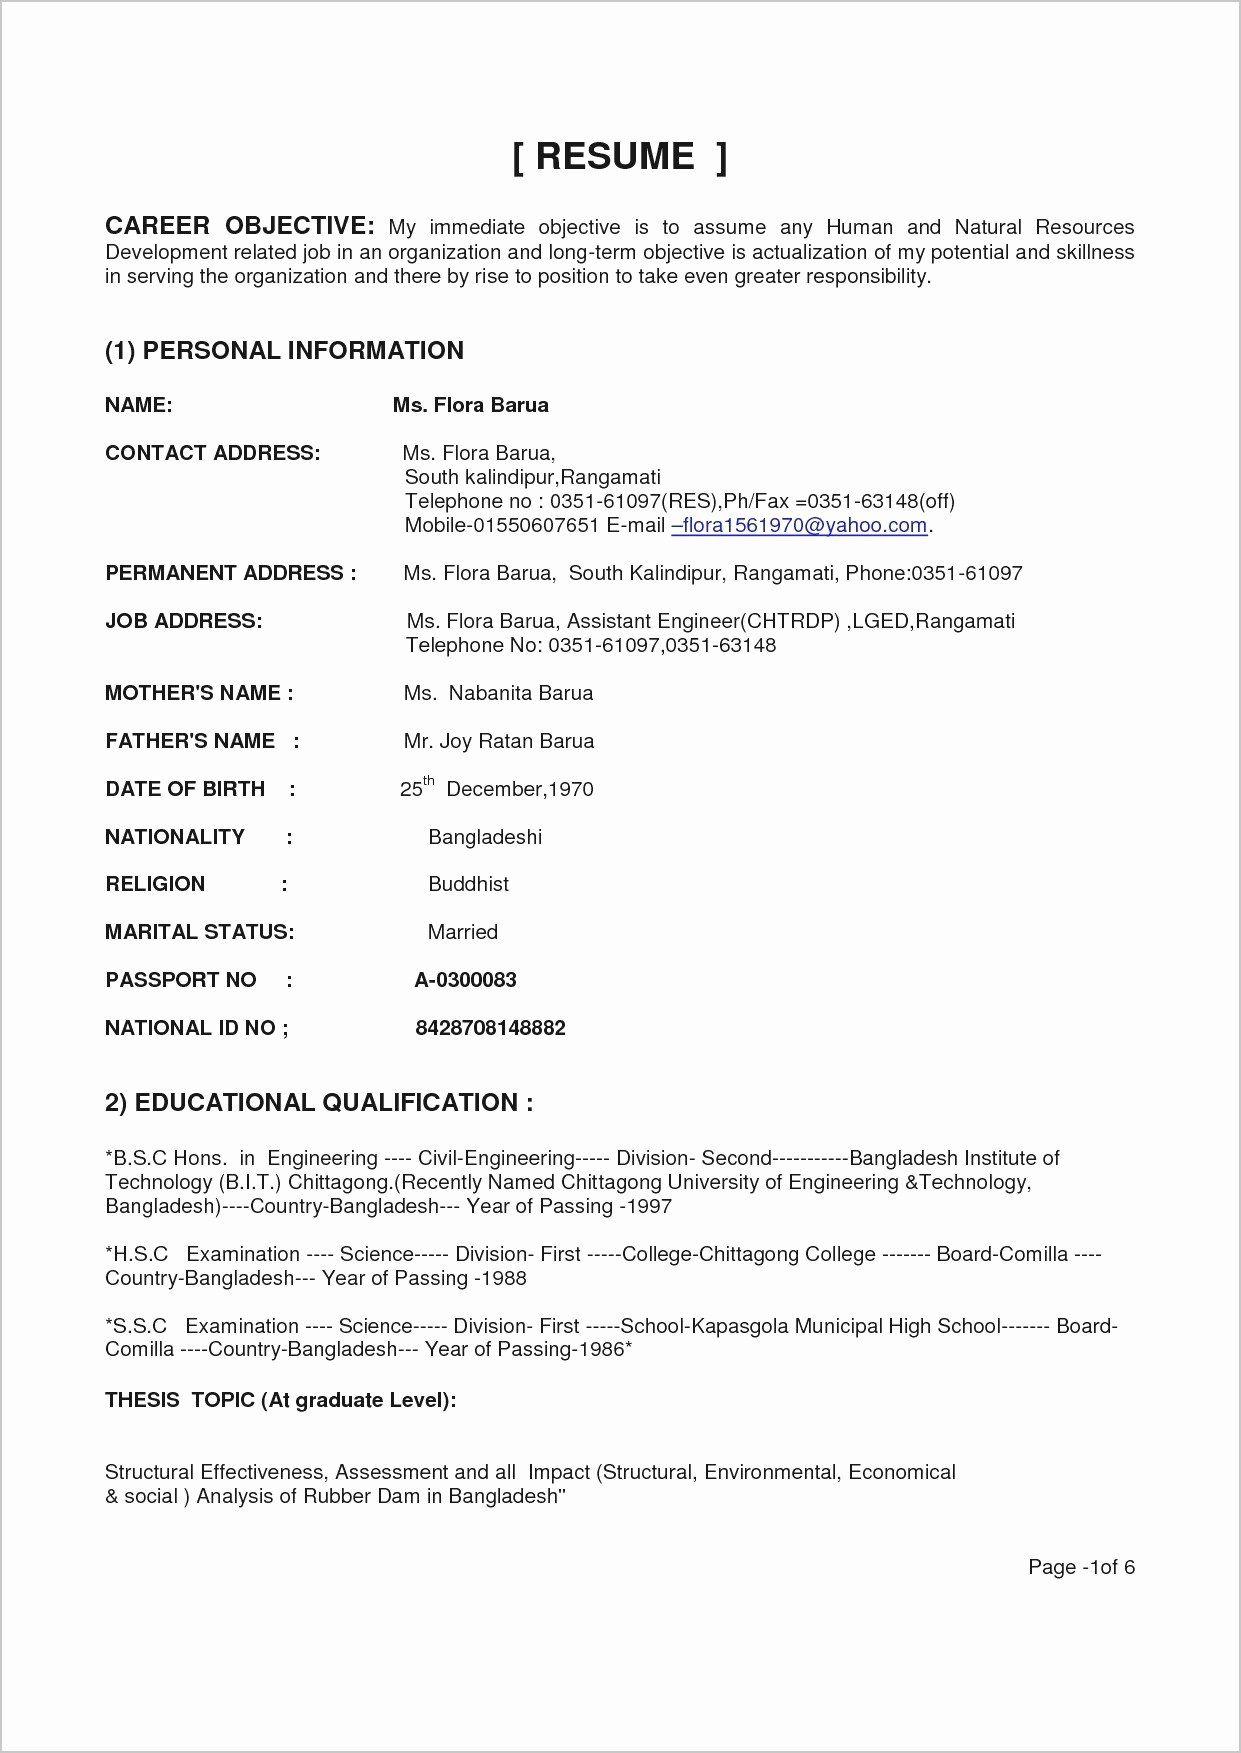 Civil Engineering Internship Resume Lovely 19 Civil Engineering Internship Resume Examples Civil Engineer Resume Engineering Resume Student Resume Template